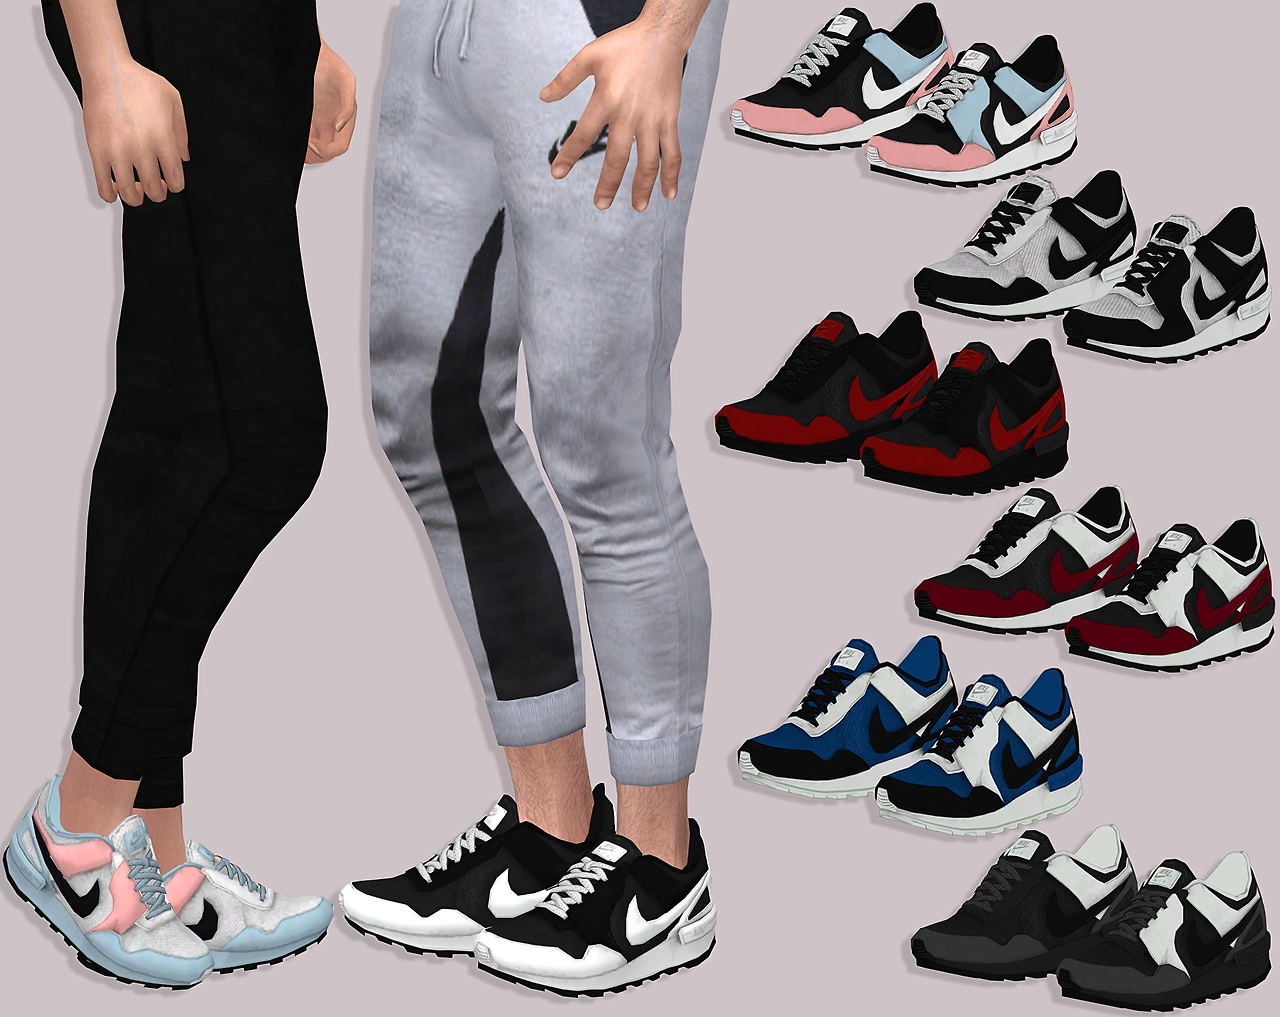 Sims CcSemller Nike CcFlowerchamberLumy CcFlowerchamberLumy 4 Sims Sims 4 CcFlowerchamberLumy 4 CcSemller Nike kiuwXTOPZ